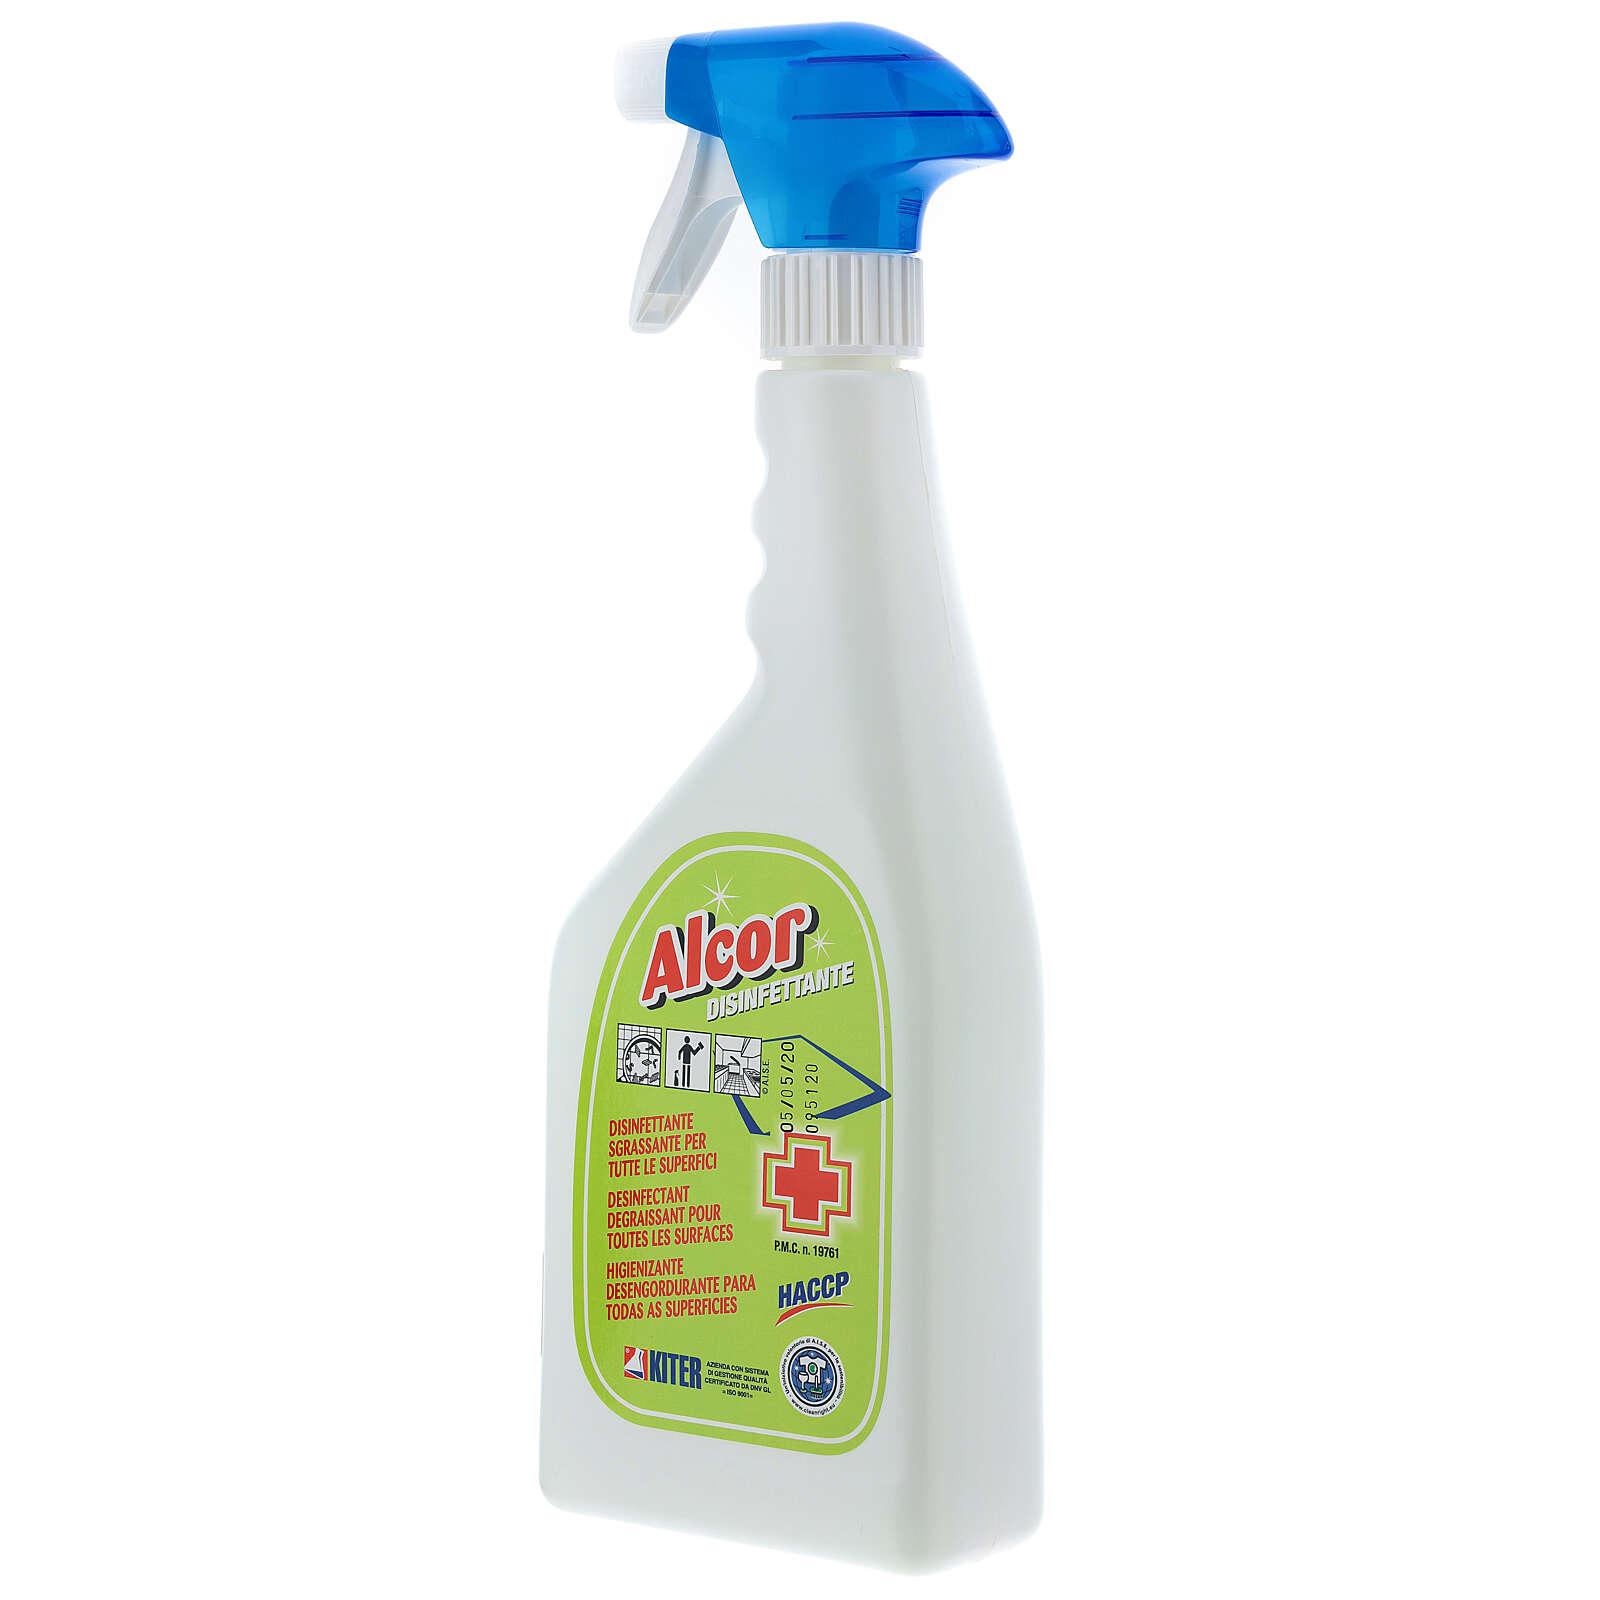 Alcor Professional Spray Disinfectant 750 ml 3